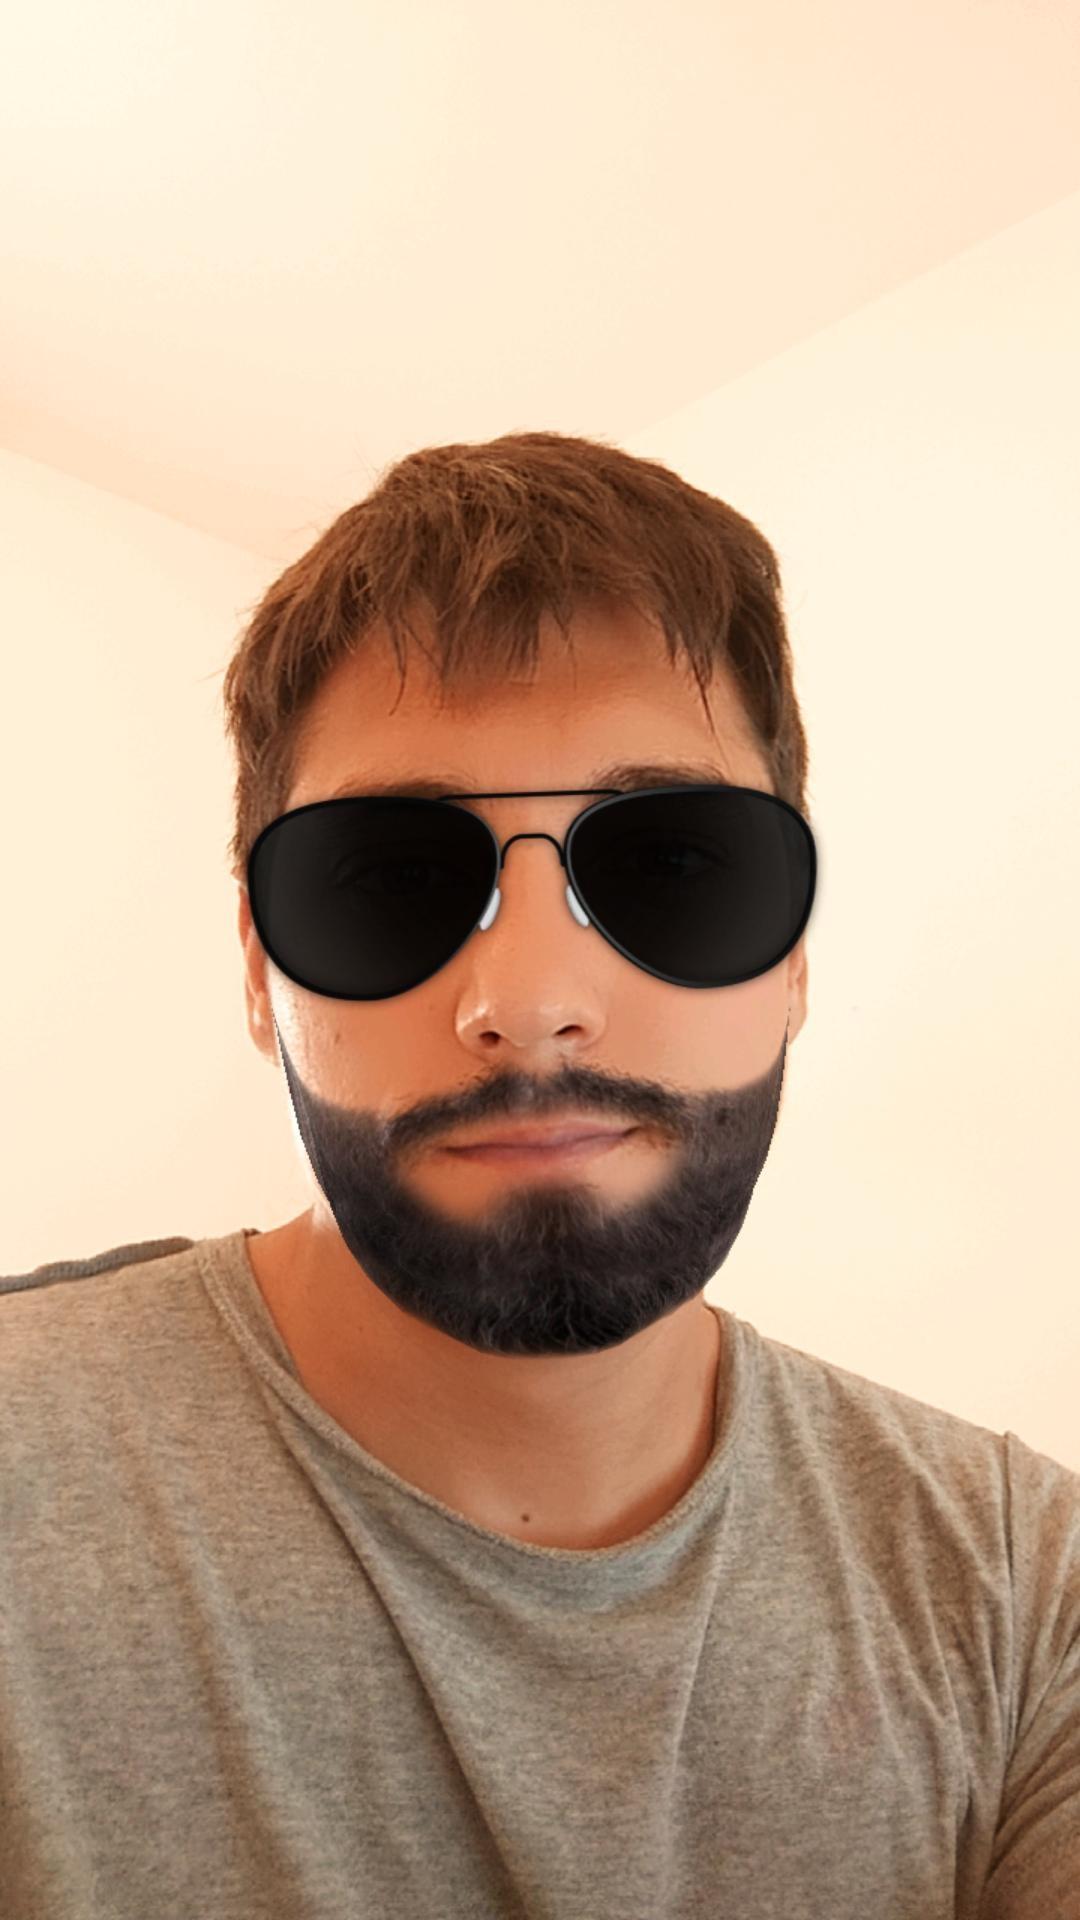 Barba e Óculos